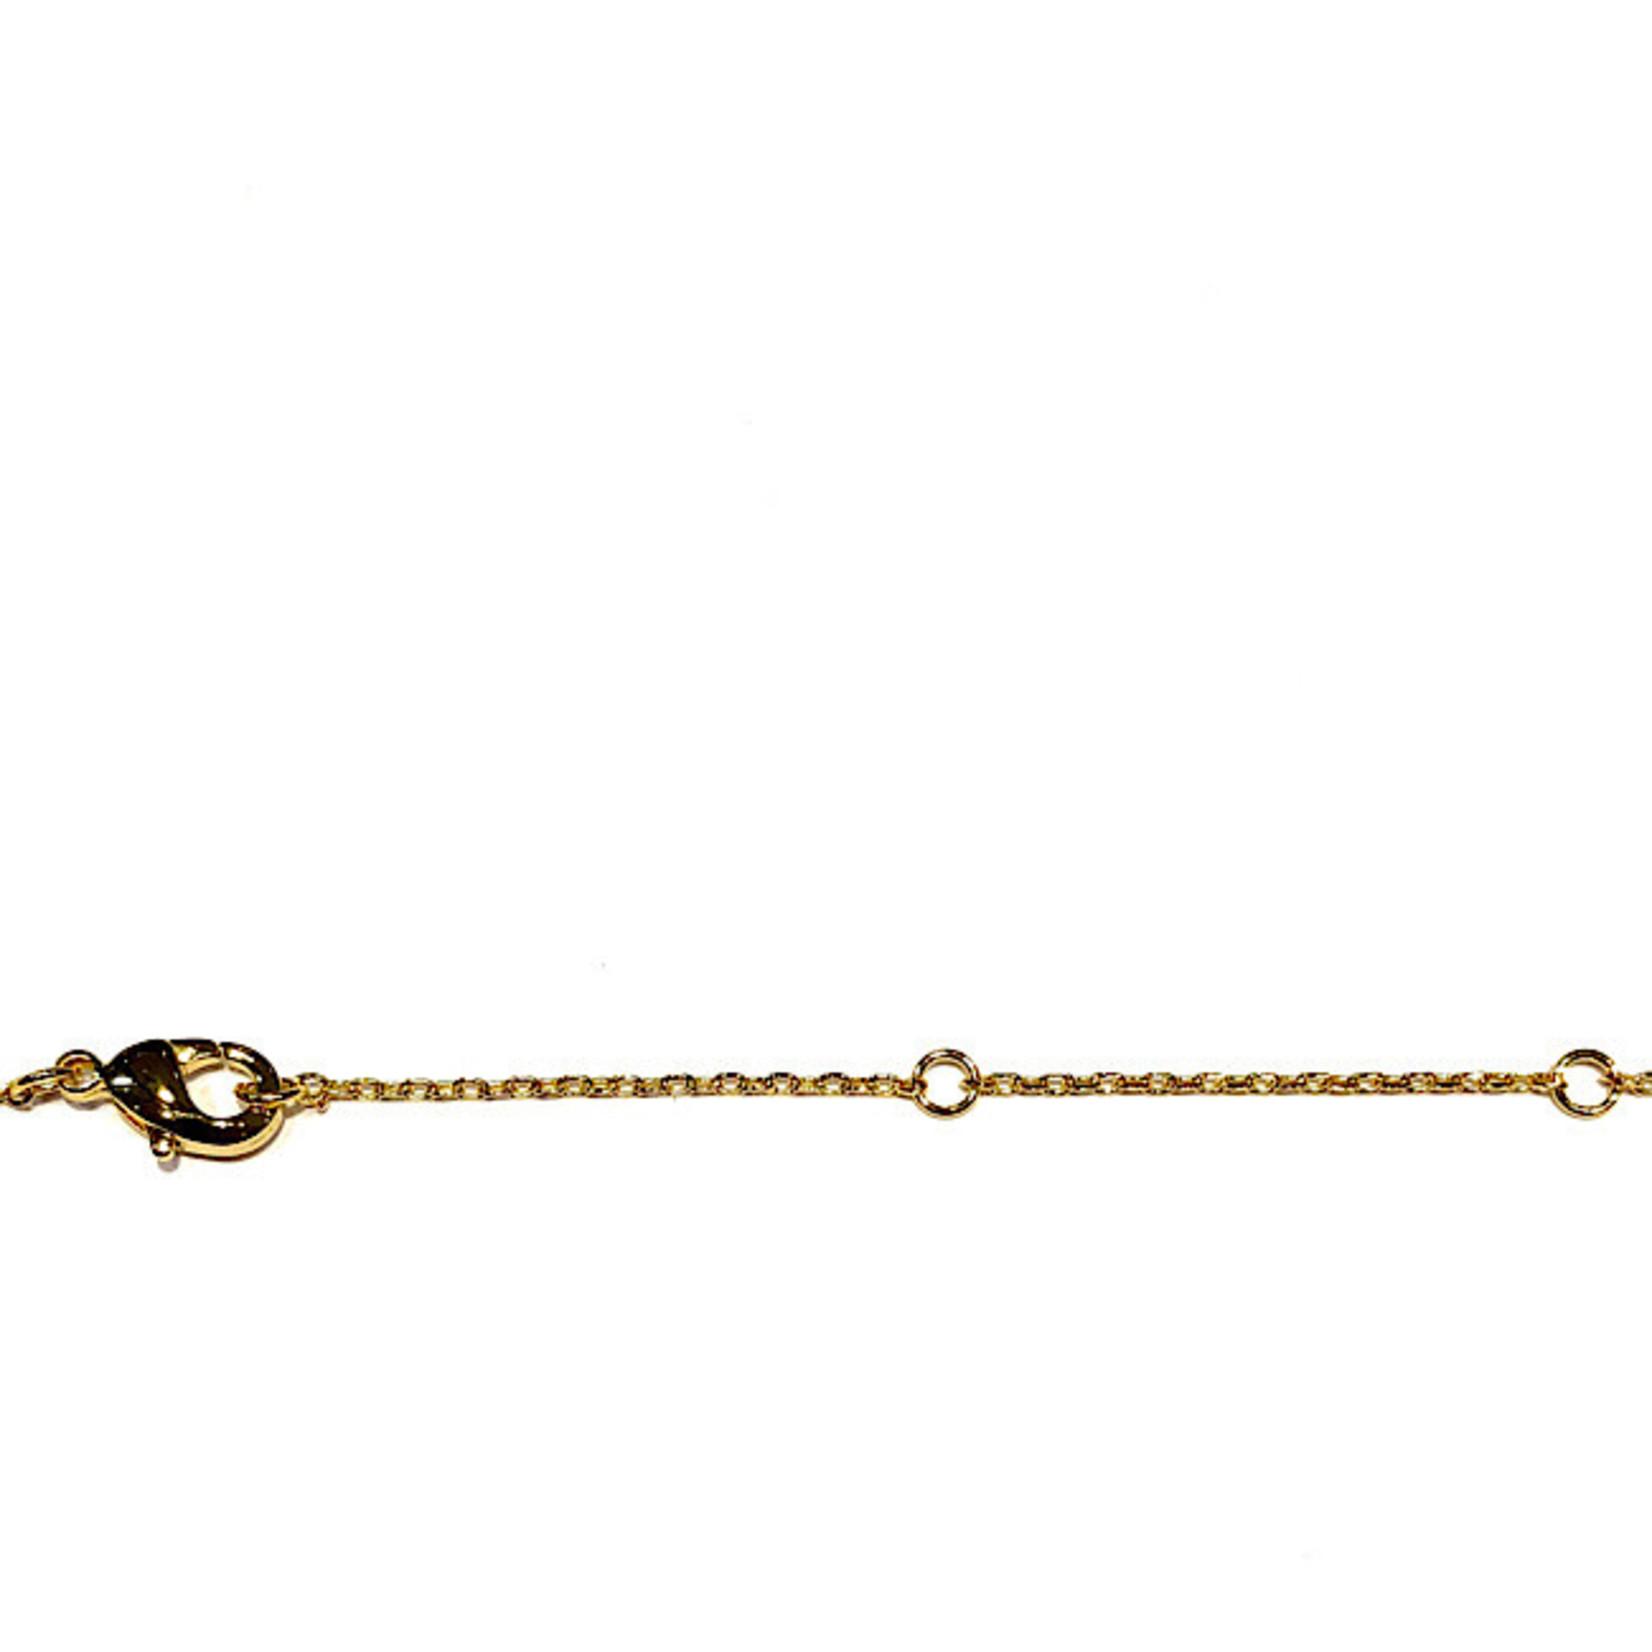 "Necklace - Bitch (Gold) (16"" + 2"" EXT.)"